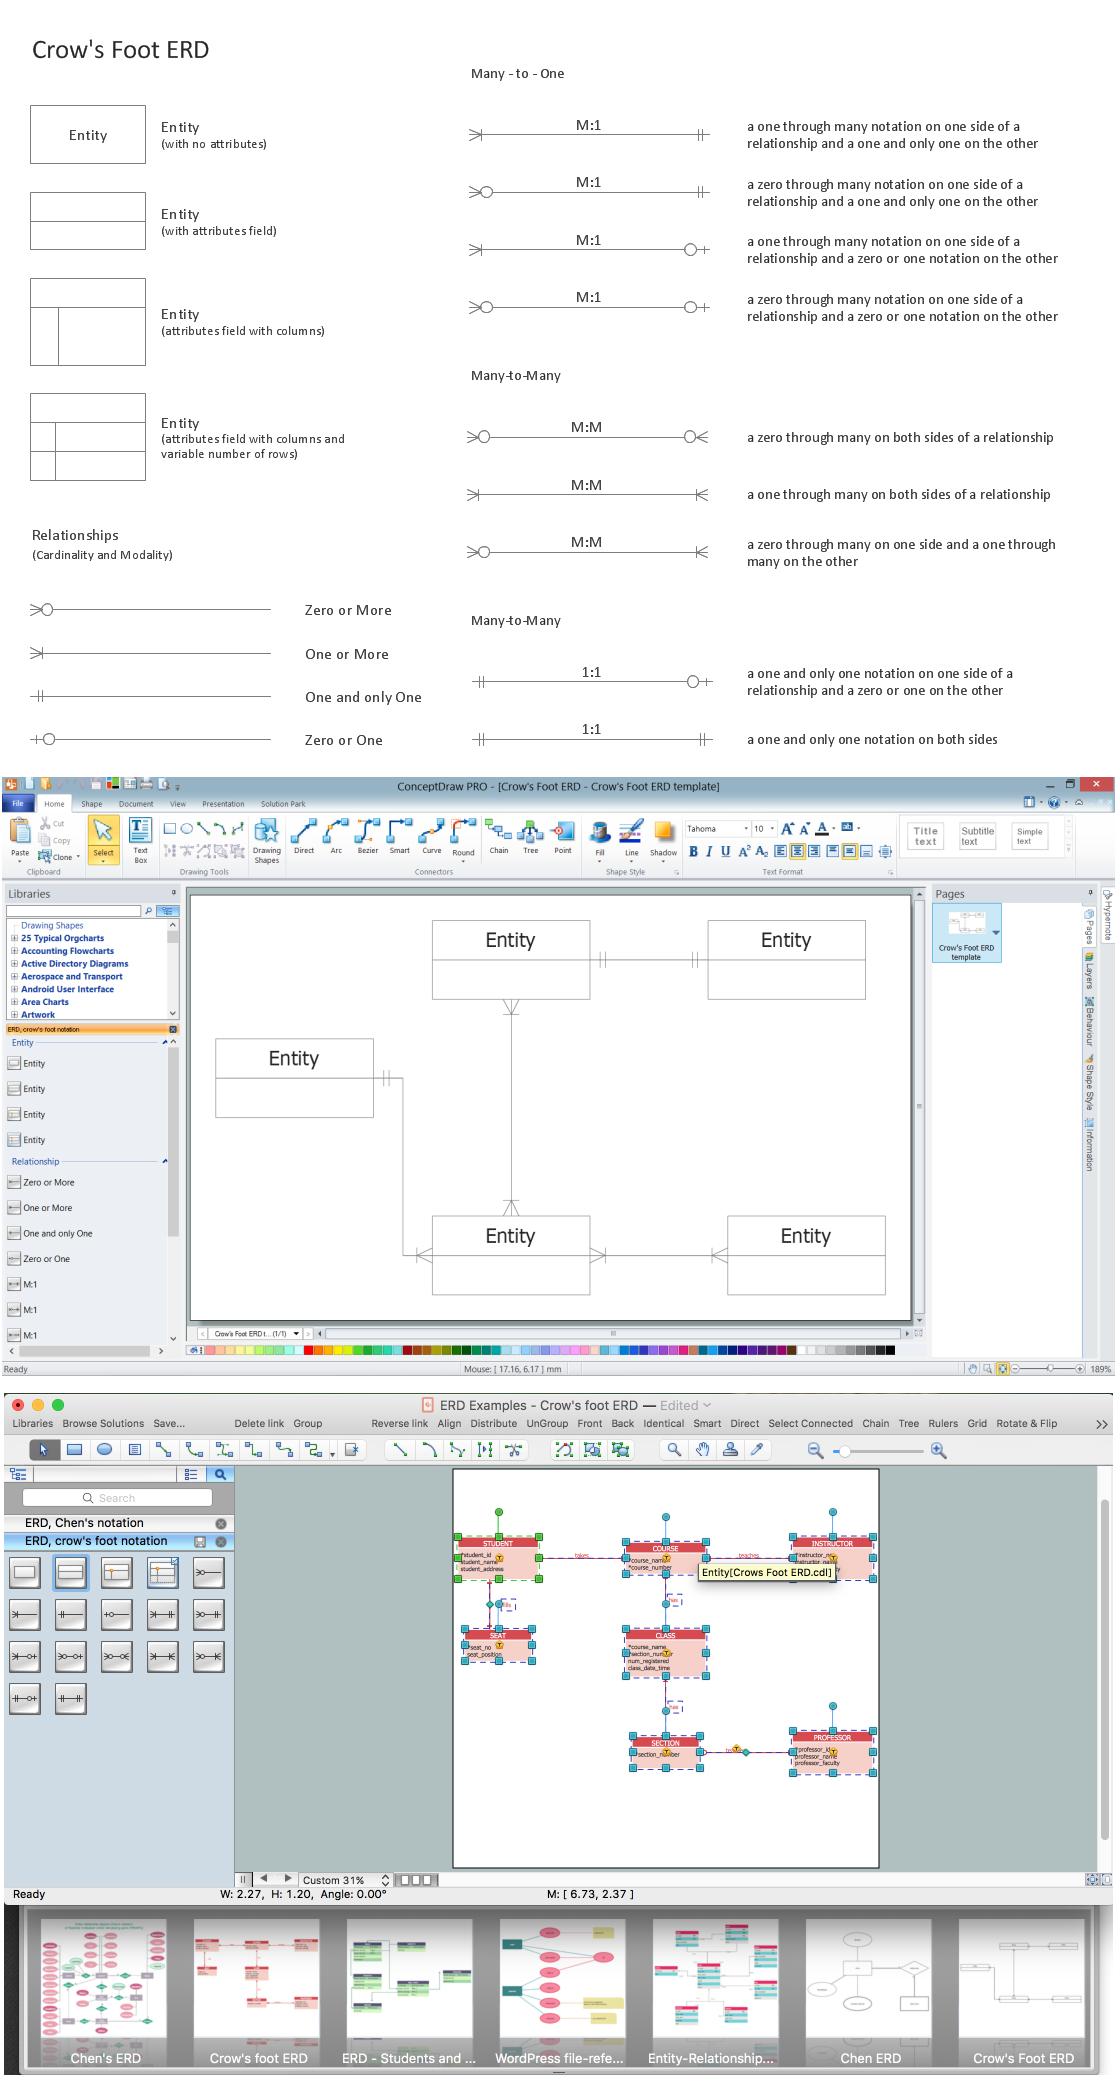 Entity Relationship Diagram - Erd - Software For Design regarding Er Diagram Crows Foot Symbols